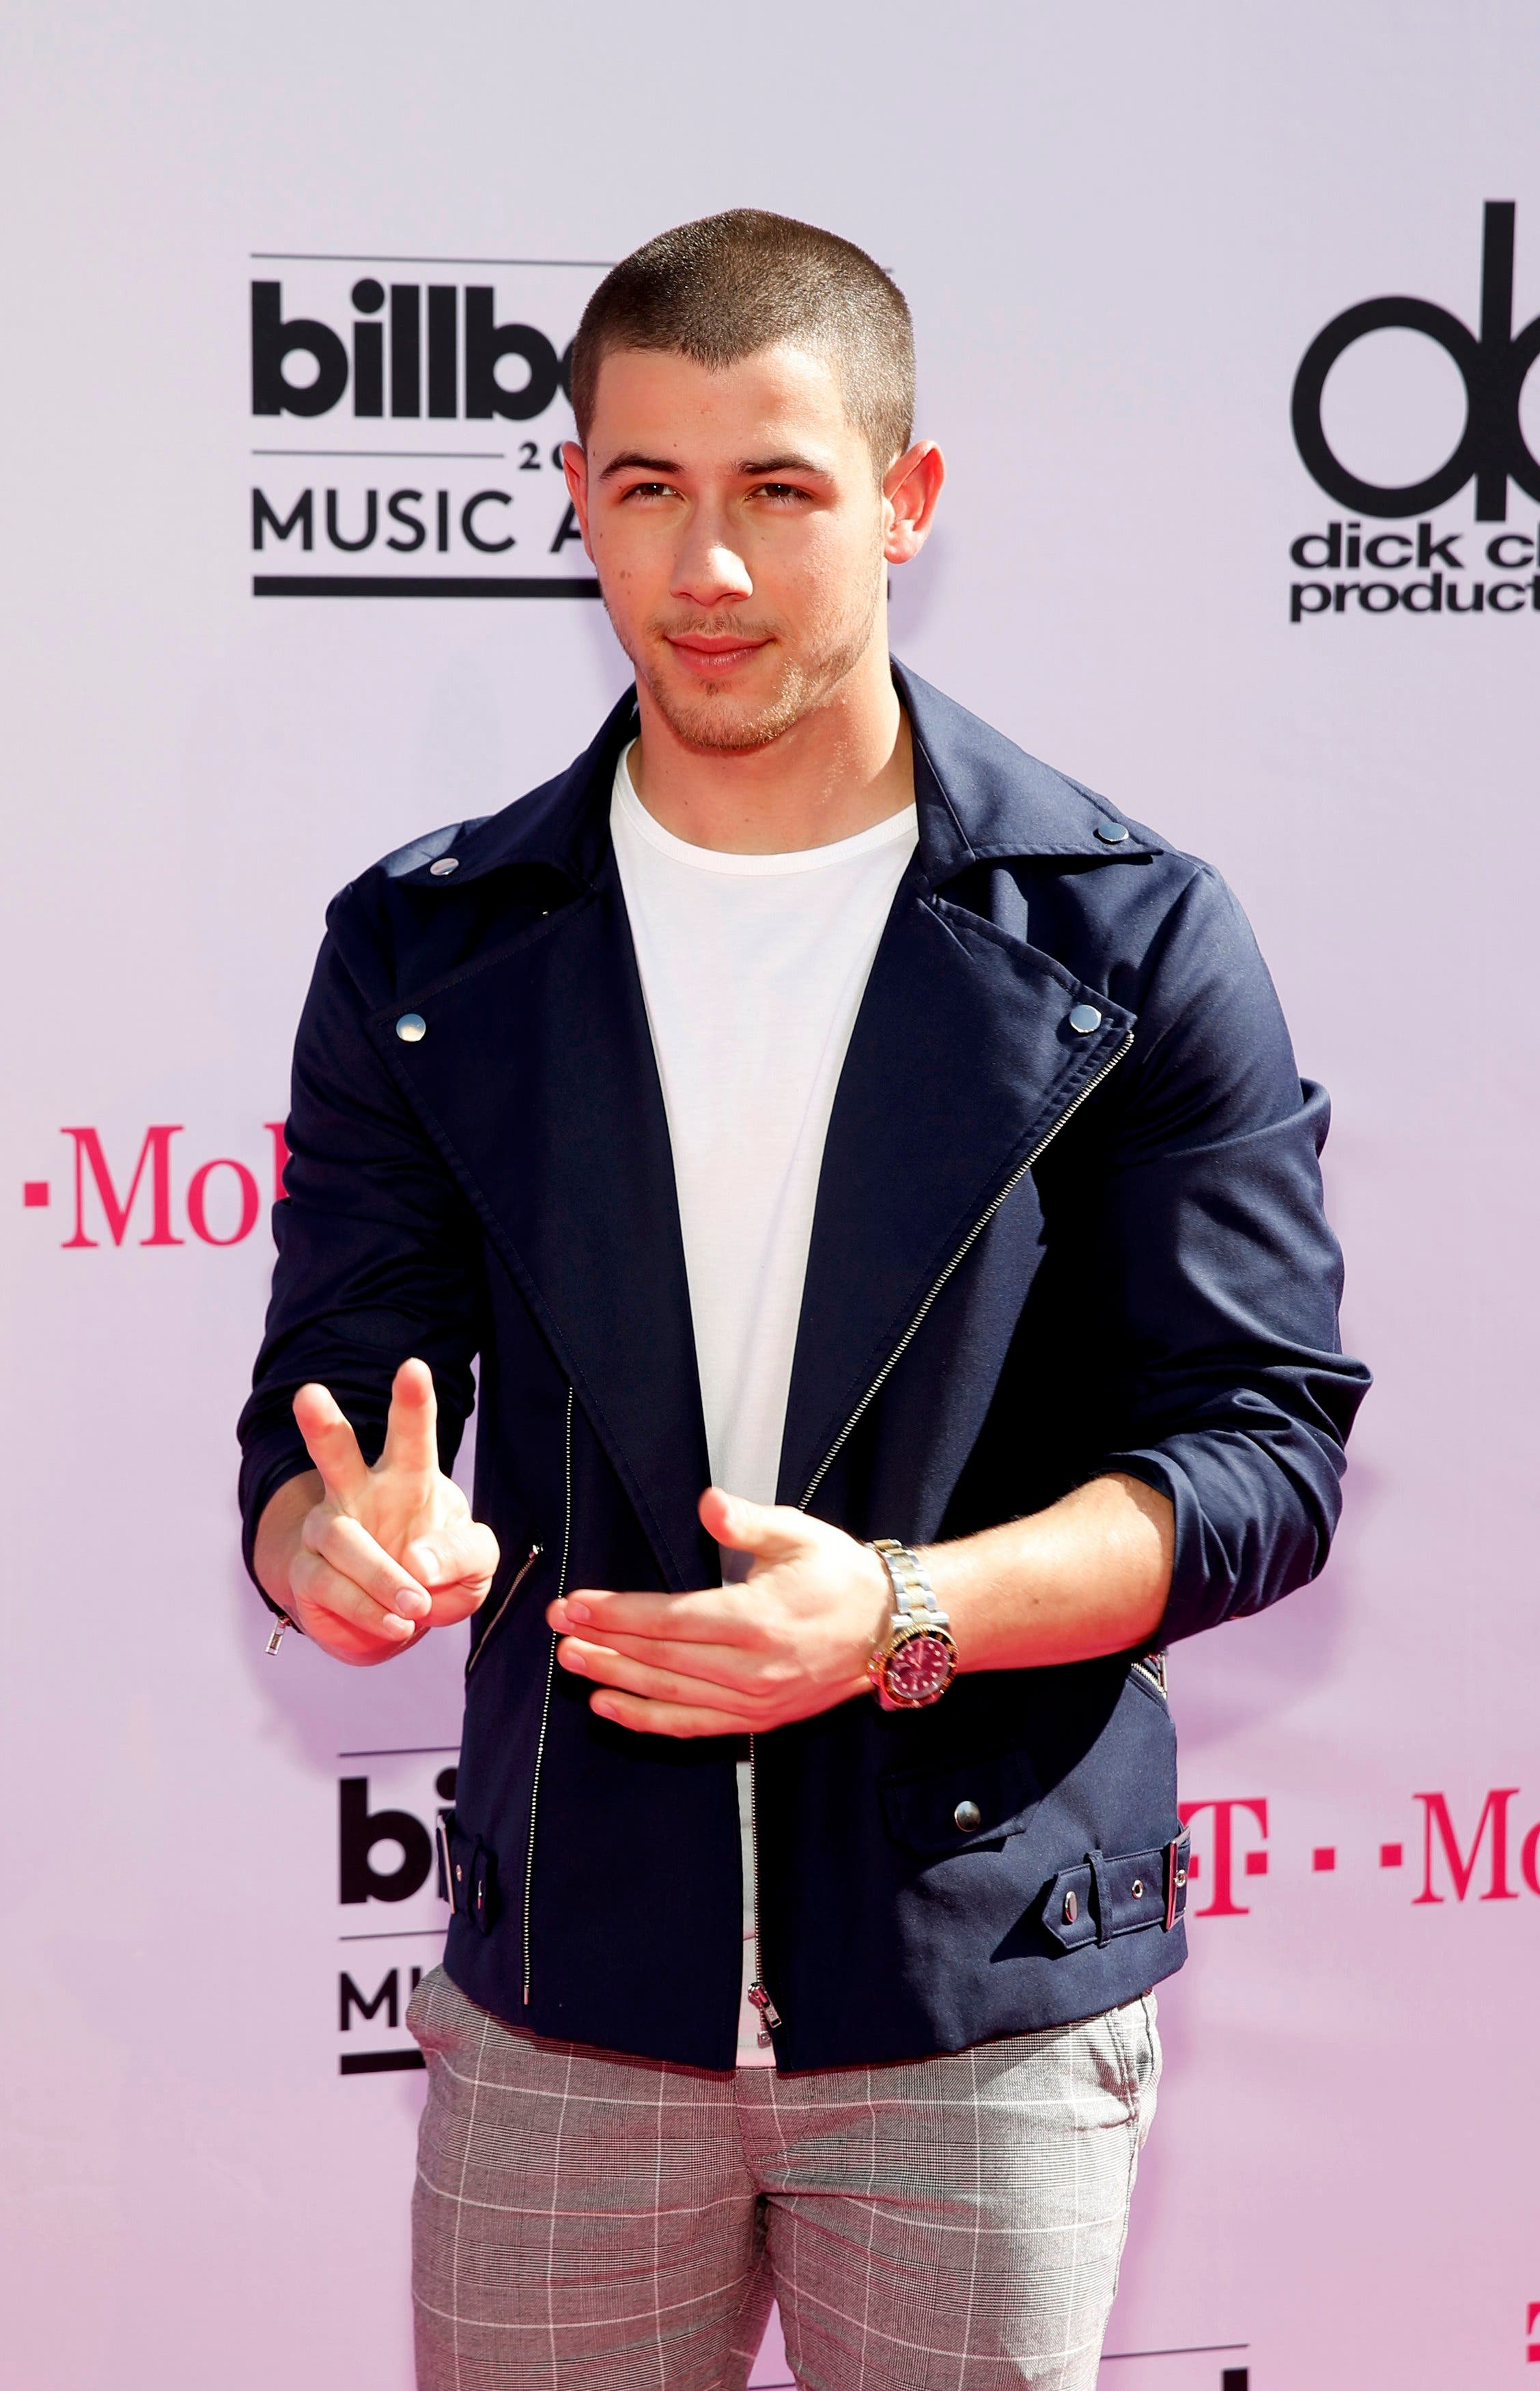 Singer Nick Jonas arrives at the 2016 Billboard Awards in Las Vegas, Nevada, US, May 22, 2016. (Reuters)